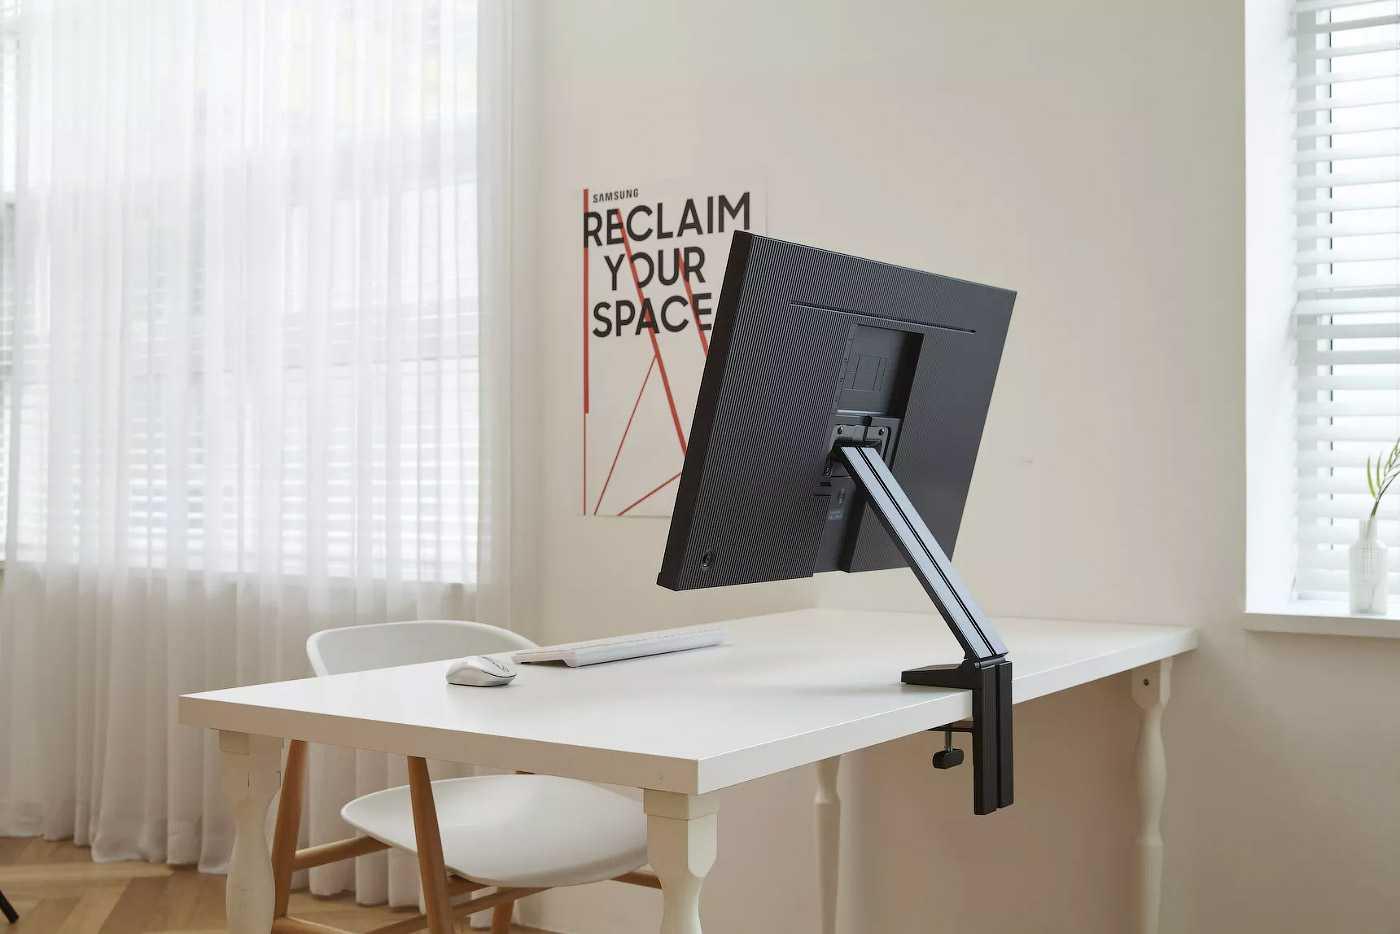 Тест и обзор: samsung s32r750uei - дизайн, освобождающий место на столе?